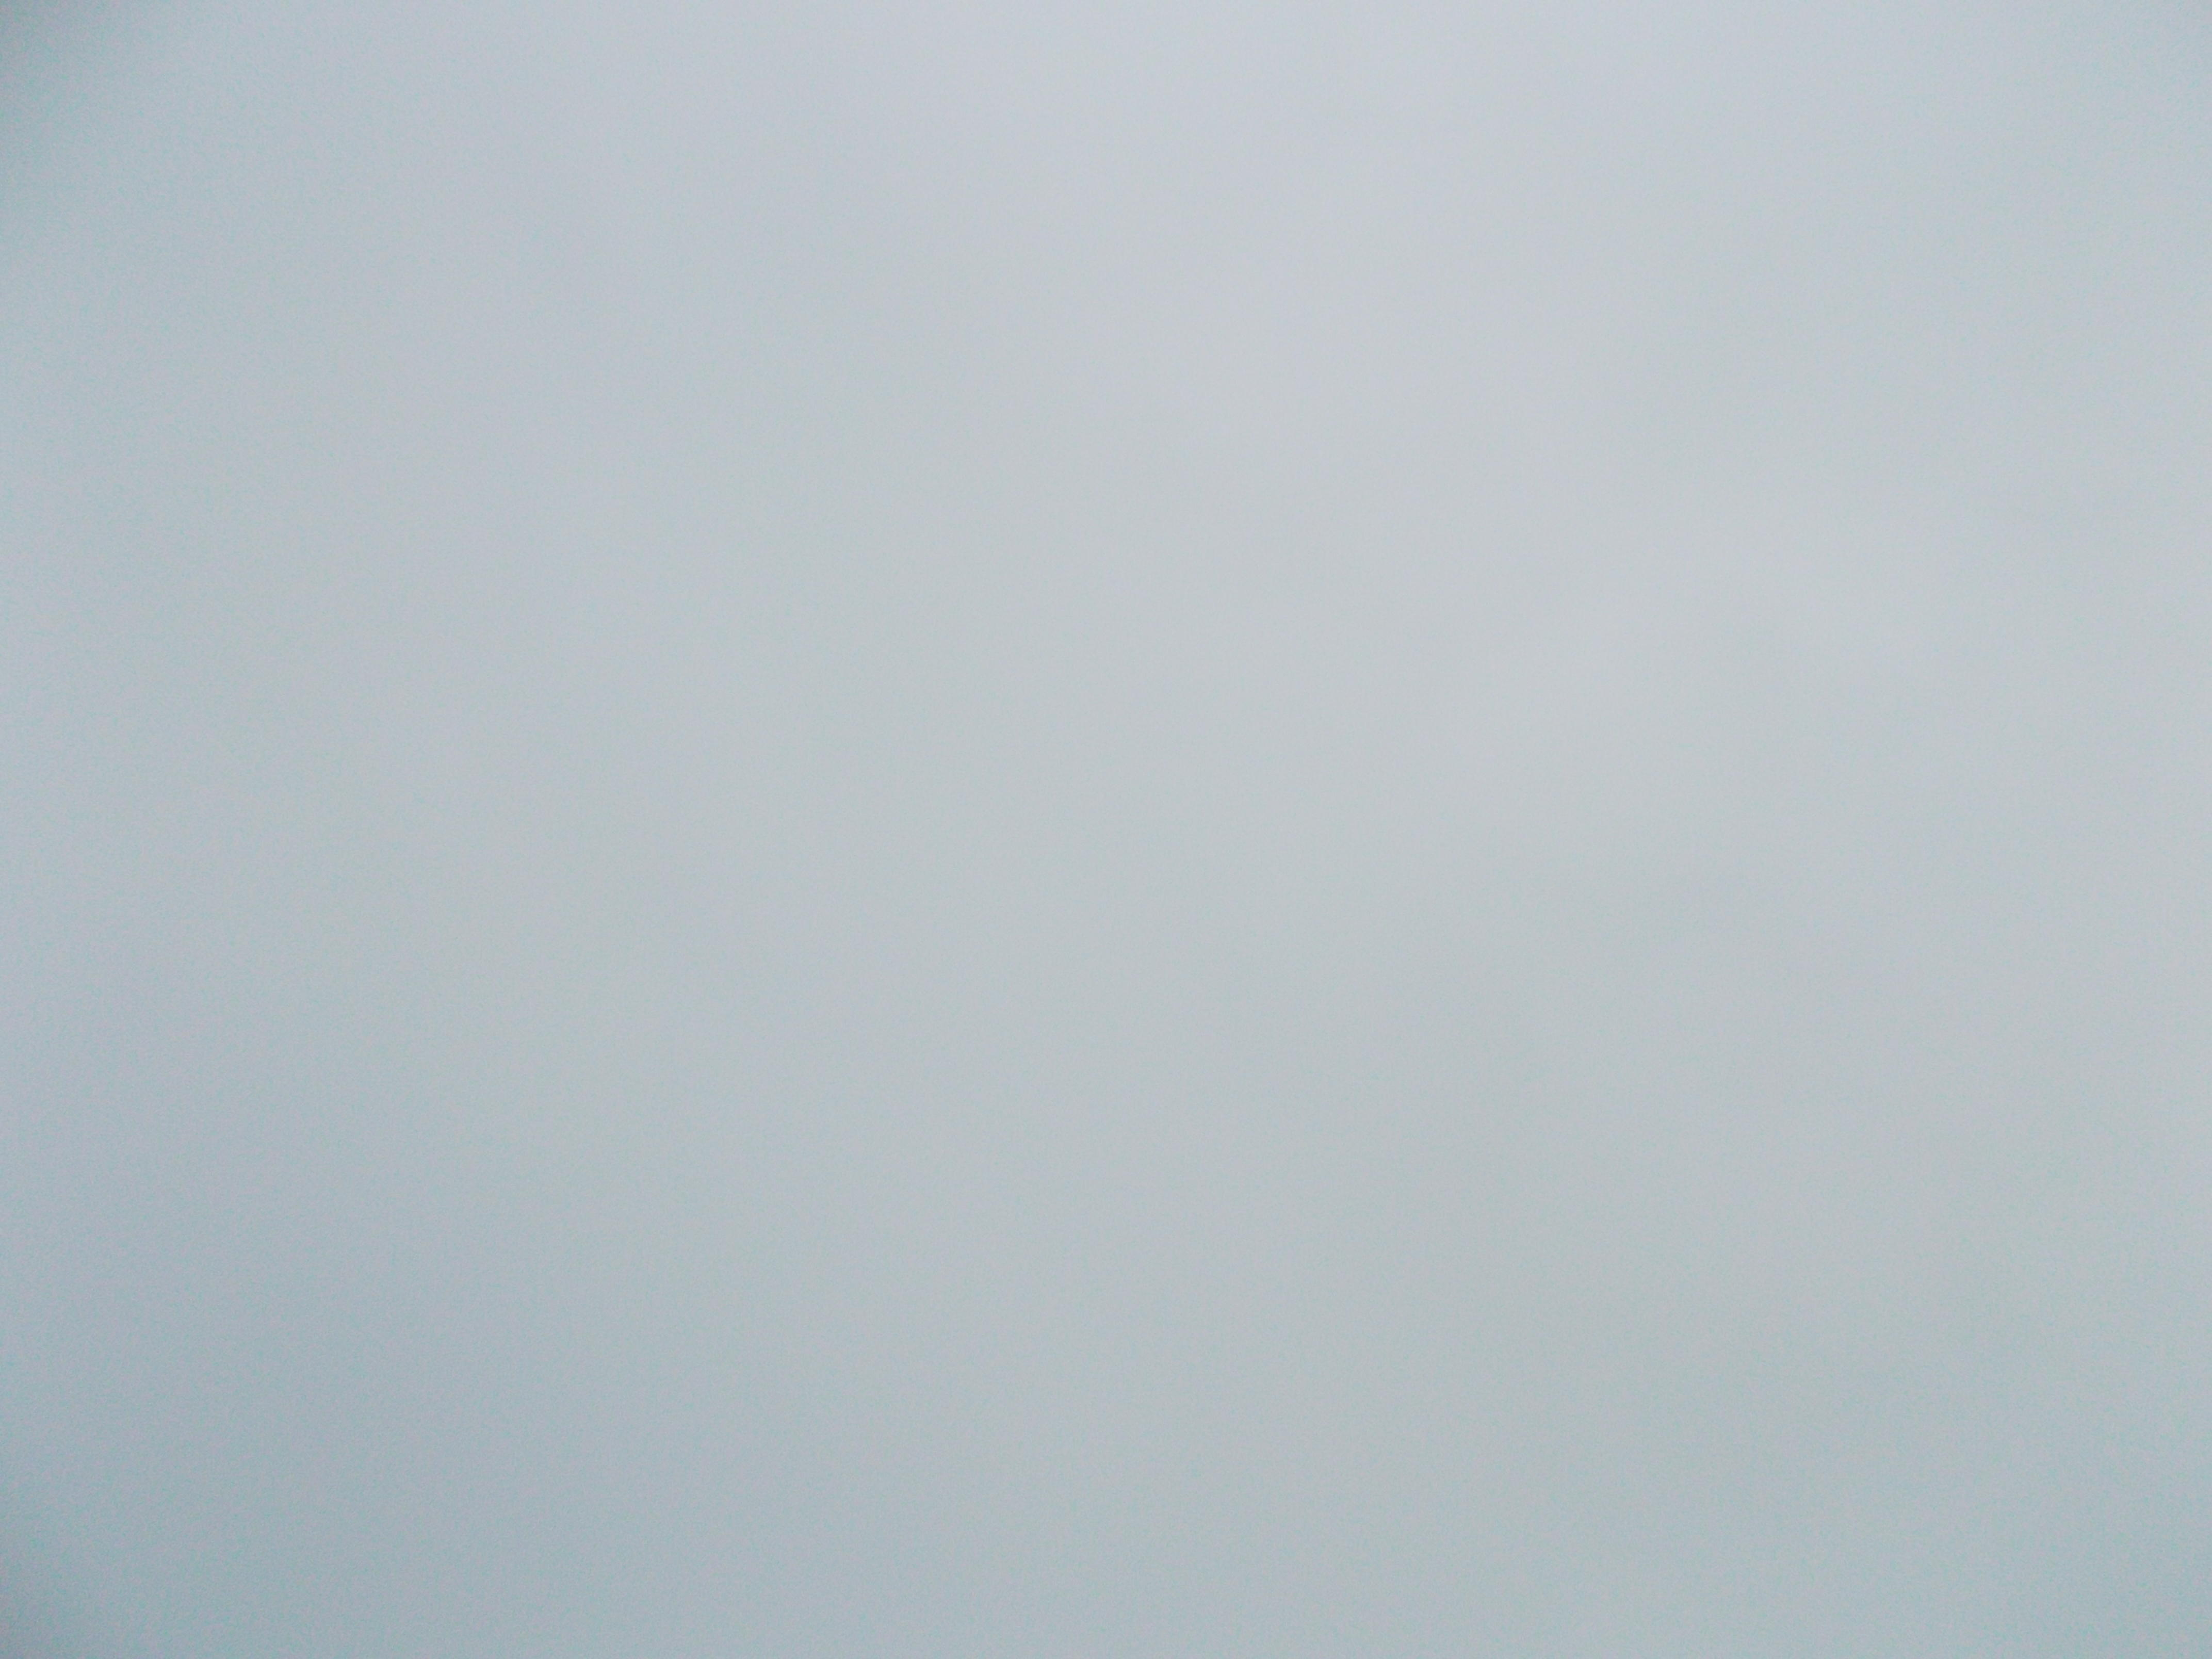 2013-05-21 Longitude -0.371 Latitude 49.182 Altitude 29 Heure 18h23